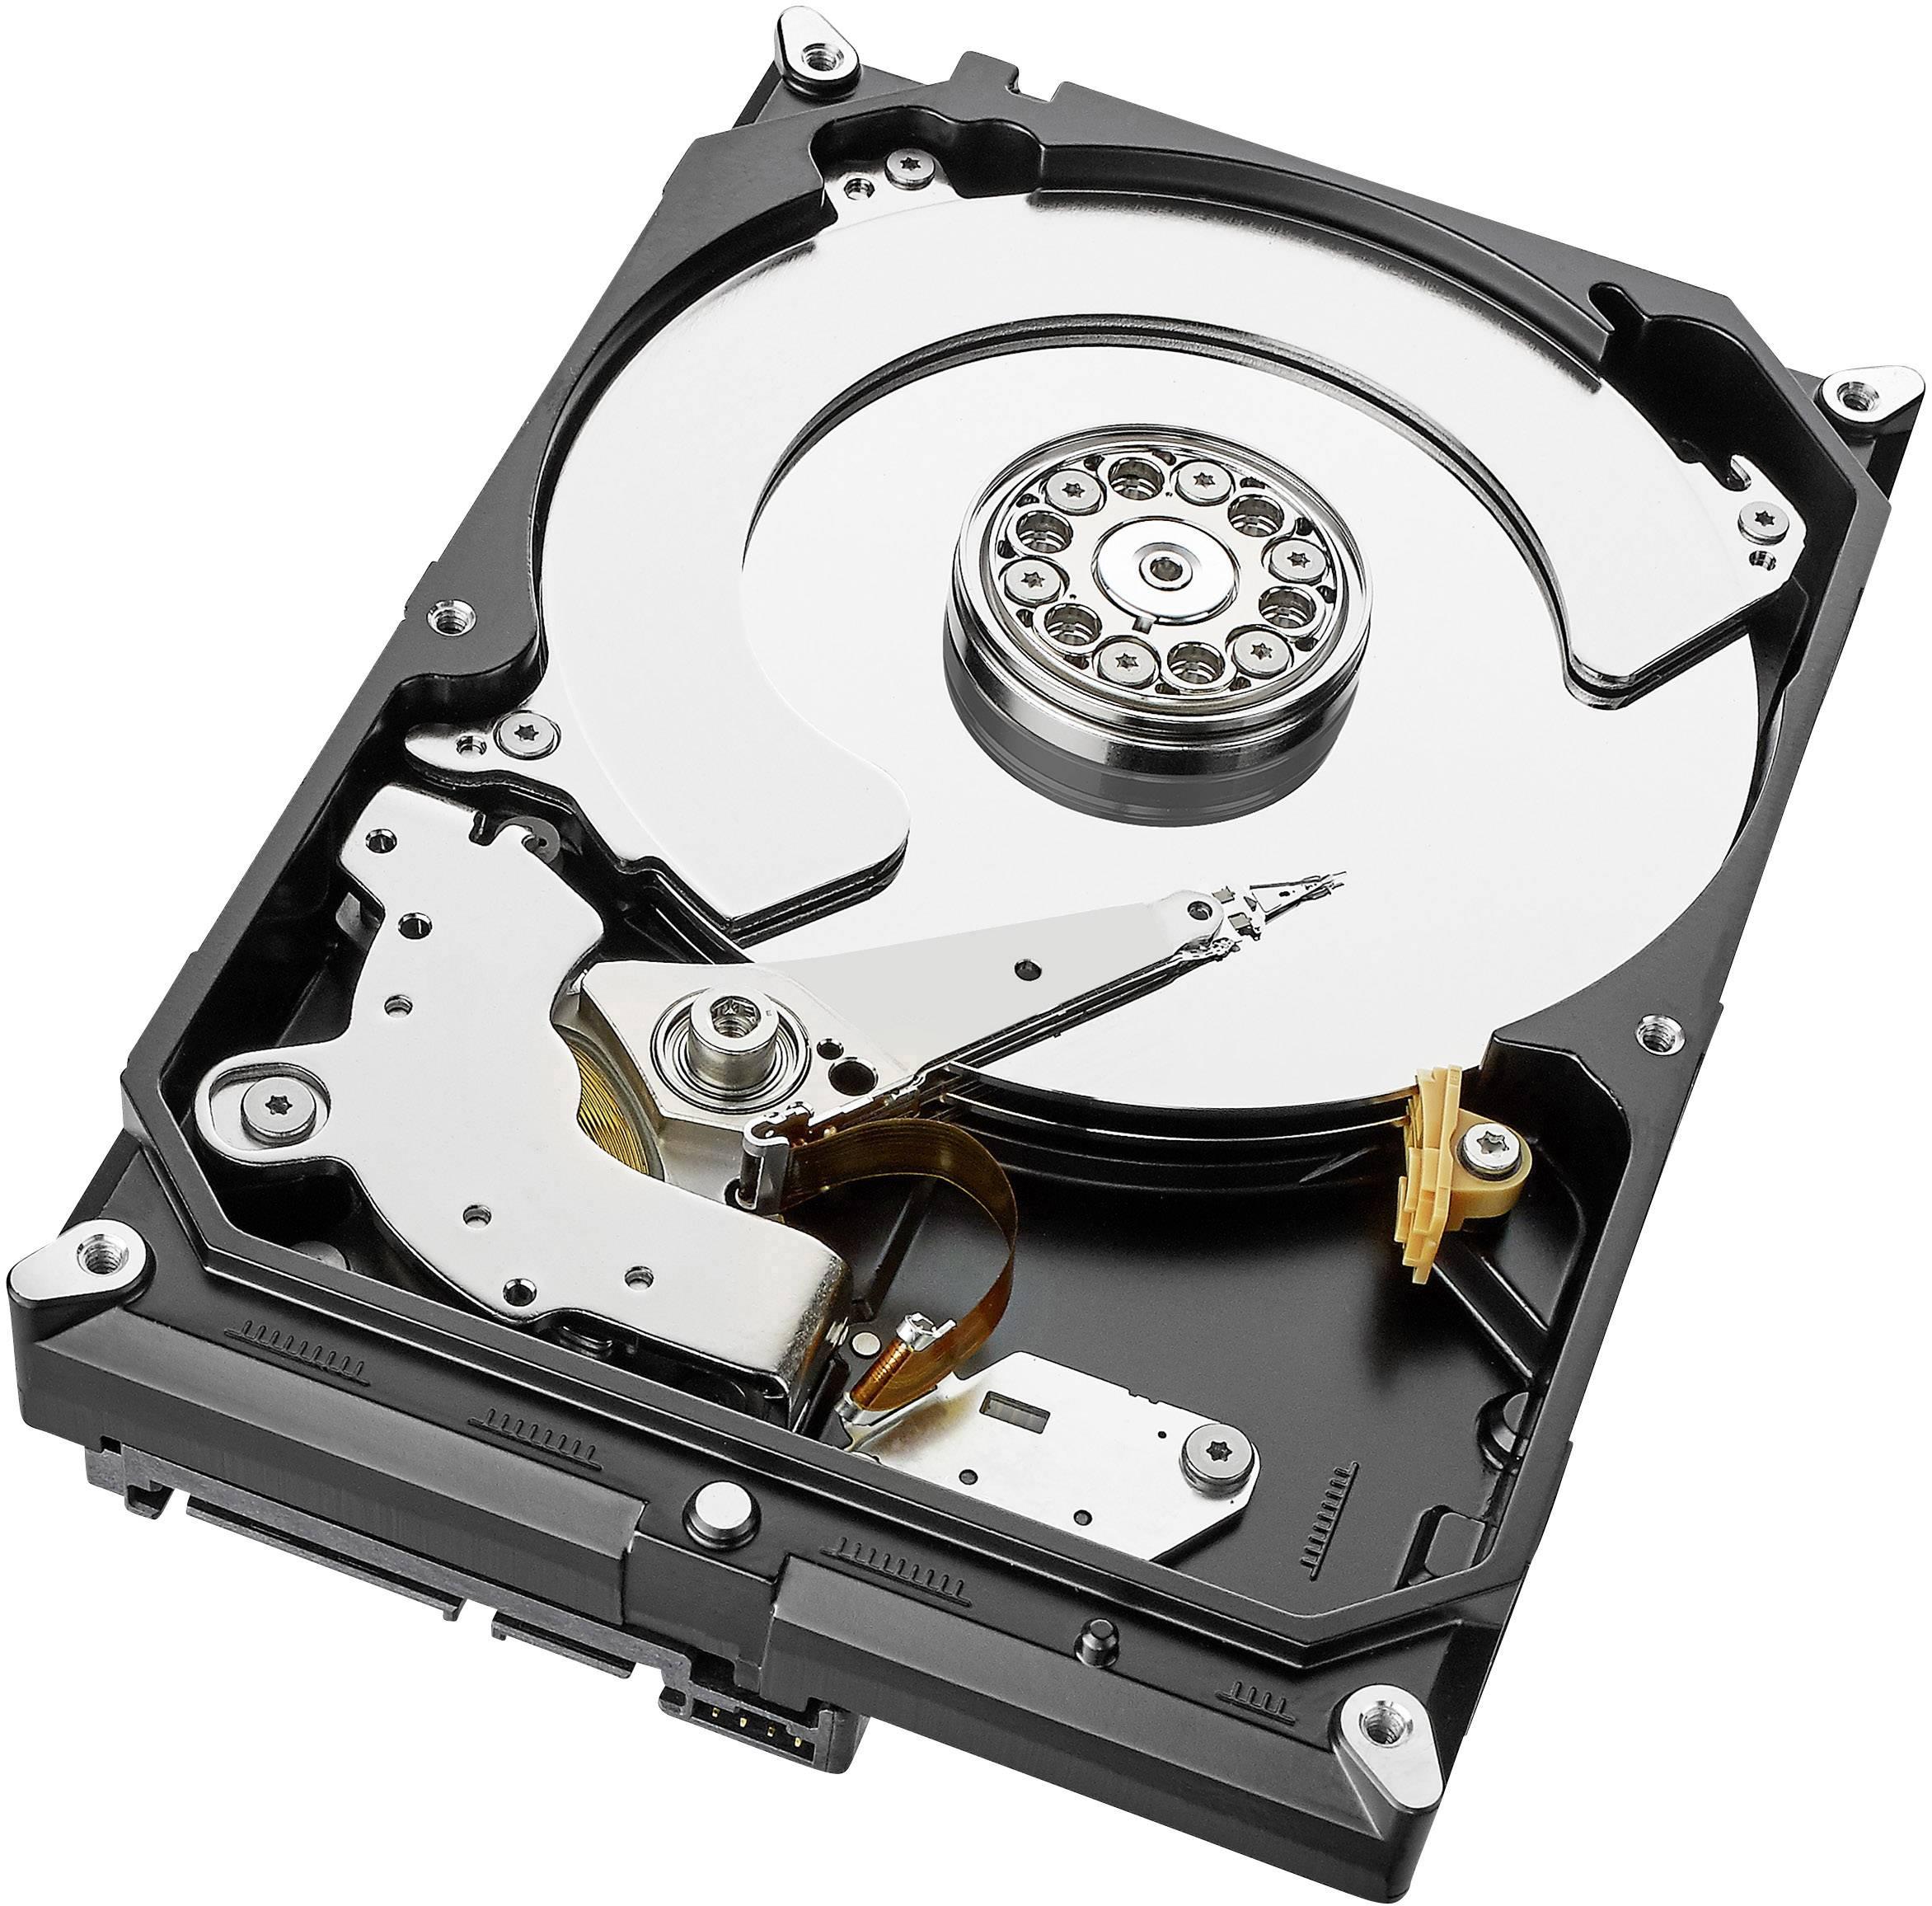 "Recertifikovaný interní pevný disk 8,9 cm (3,5"") 2 TB Hitachi Ultrastar 7K3000 Bulk HUA723020ALA641-FR SATA III"